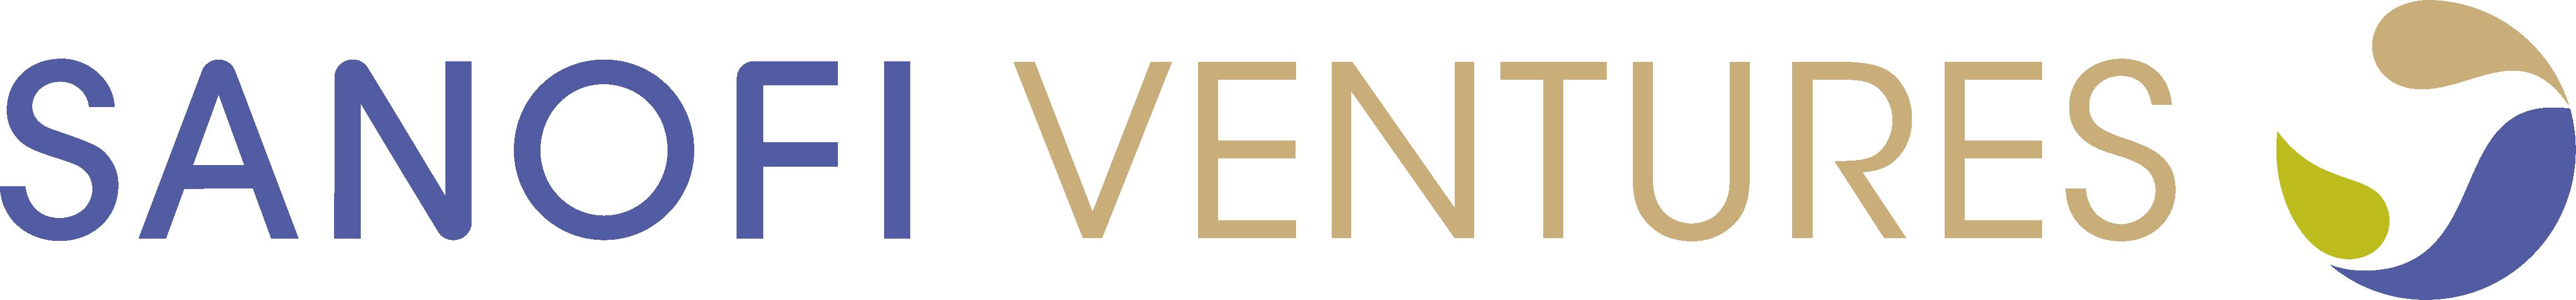 Sanofi Ventures Logo_RGB_Horizontal